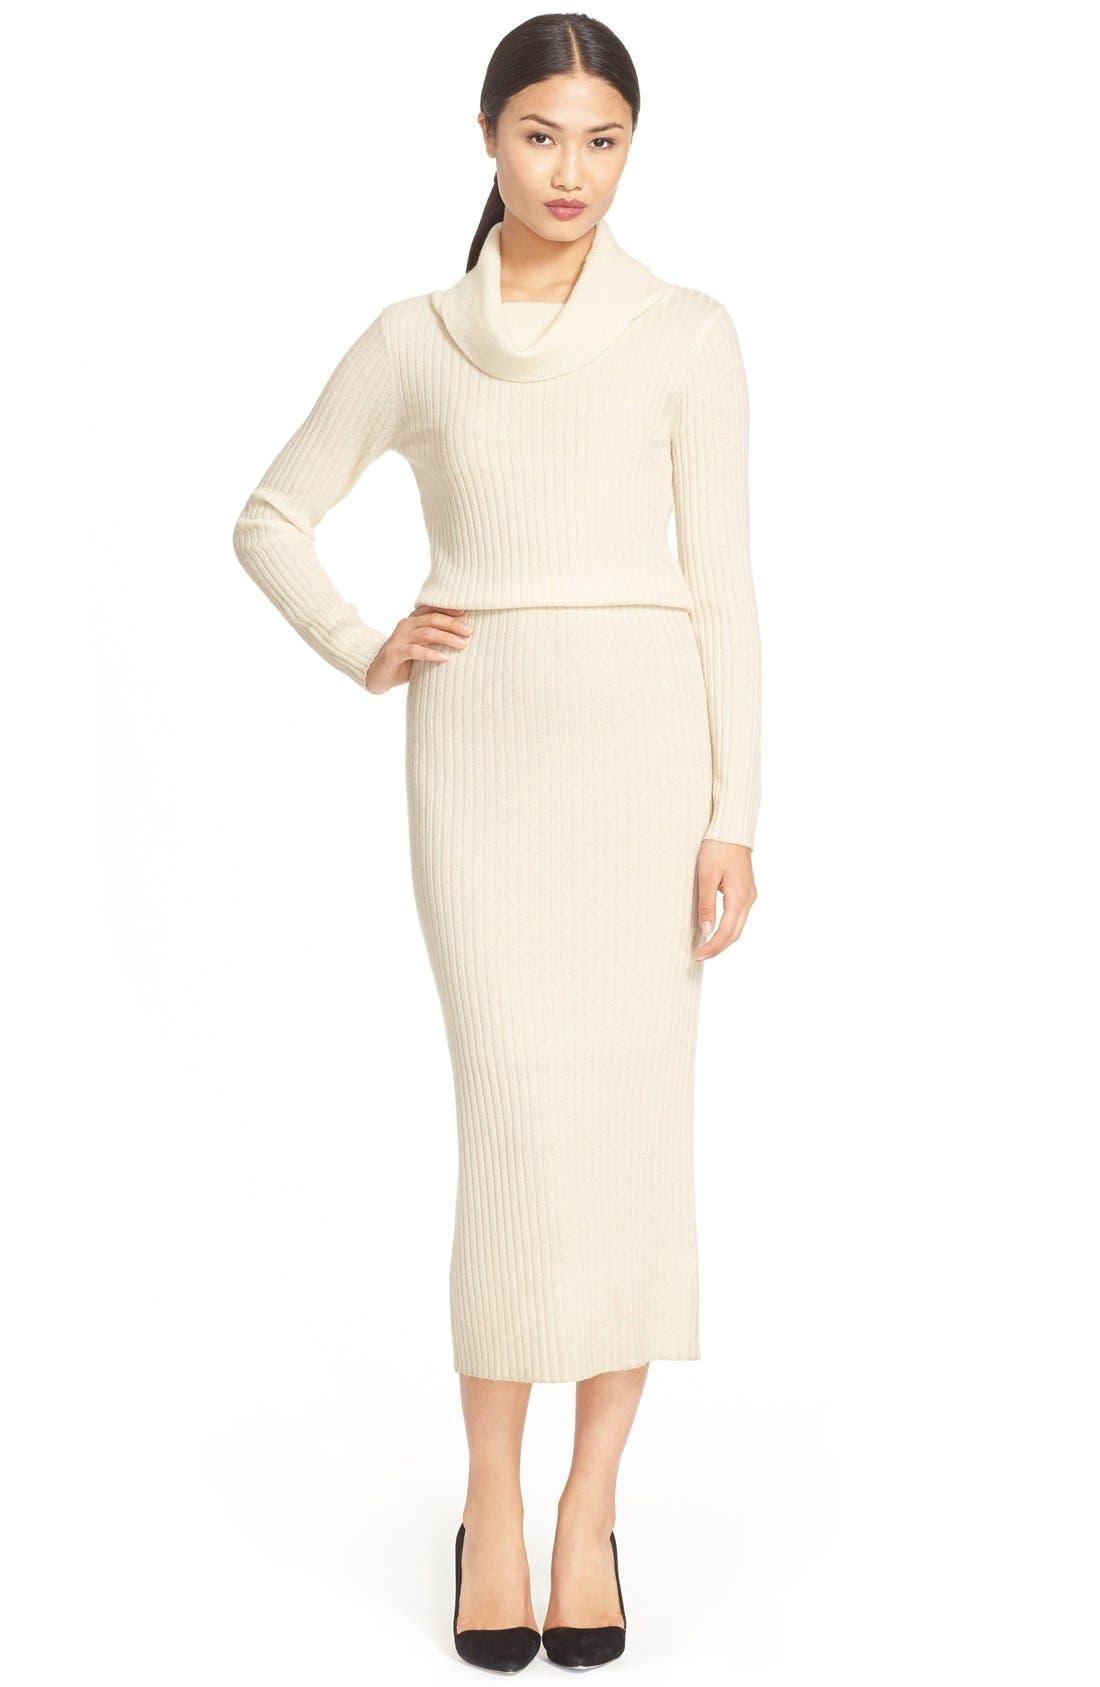 Alternate Image 1 Selected - Alice + Olivia 'Hailee' Cowl Neck Sweater Dress